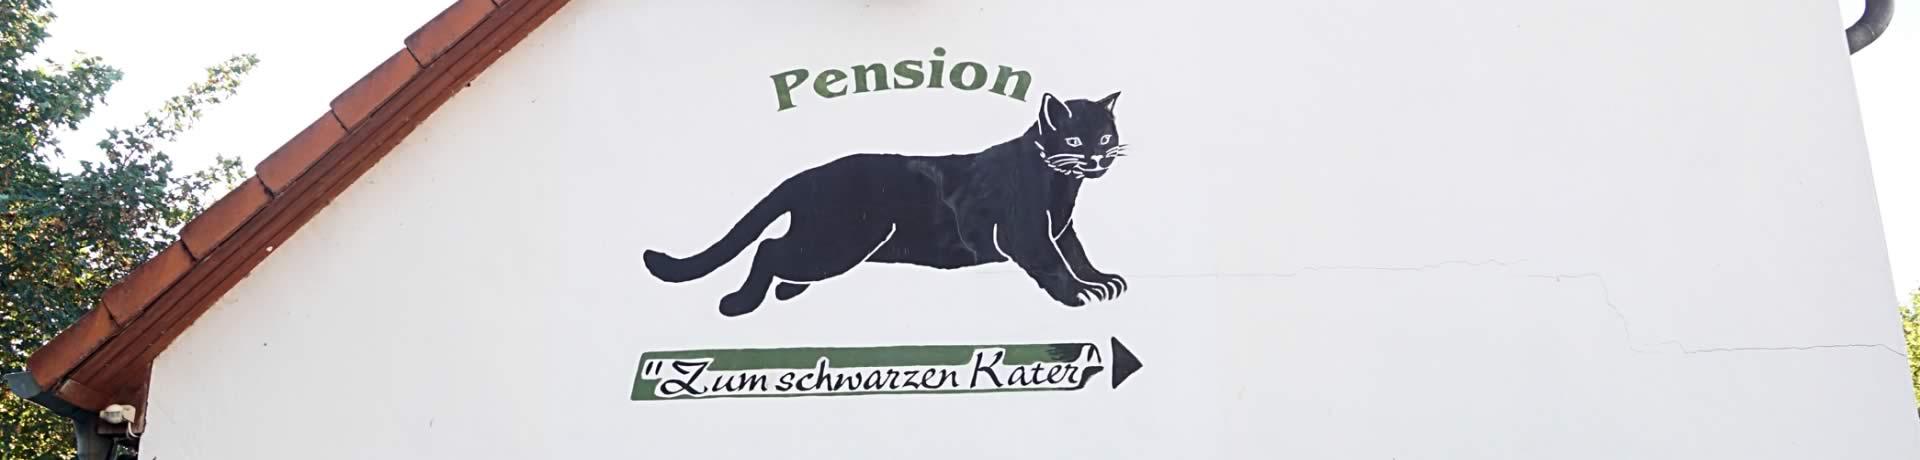 Pension Schwarzer Kater